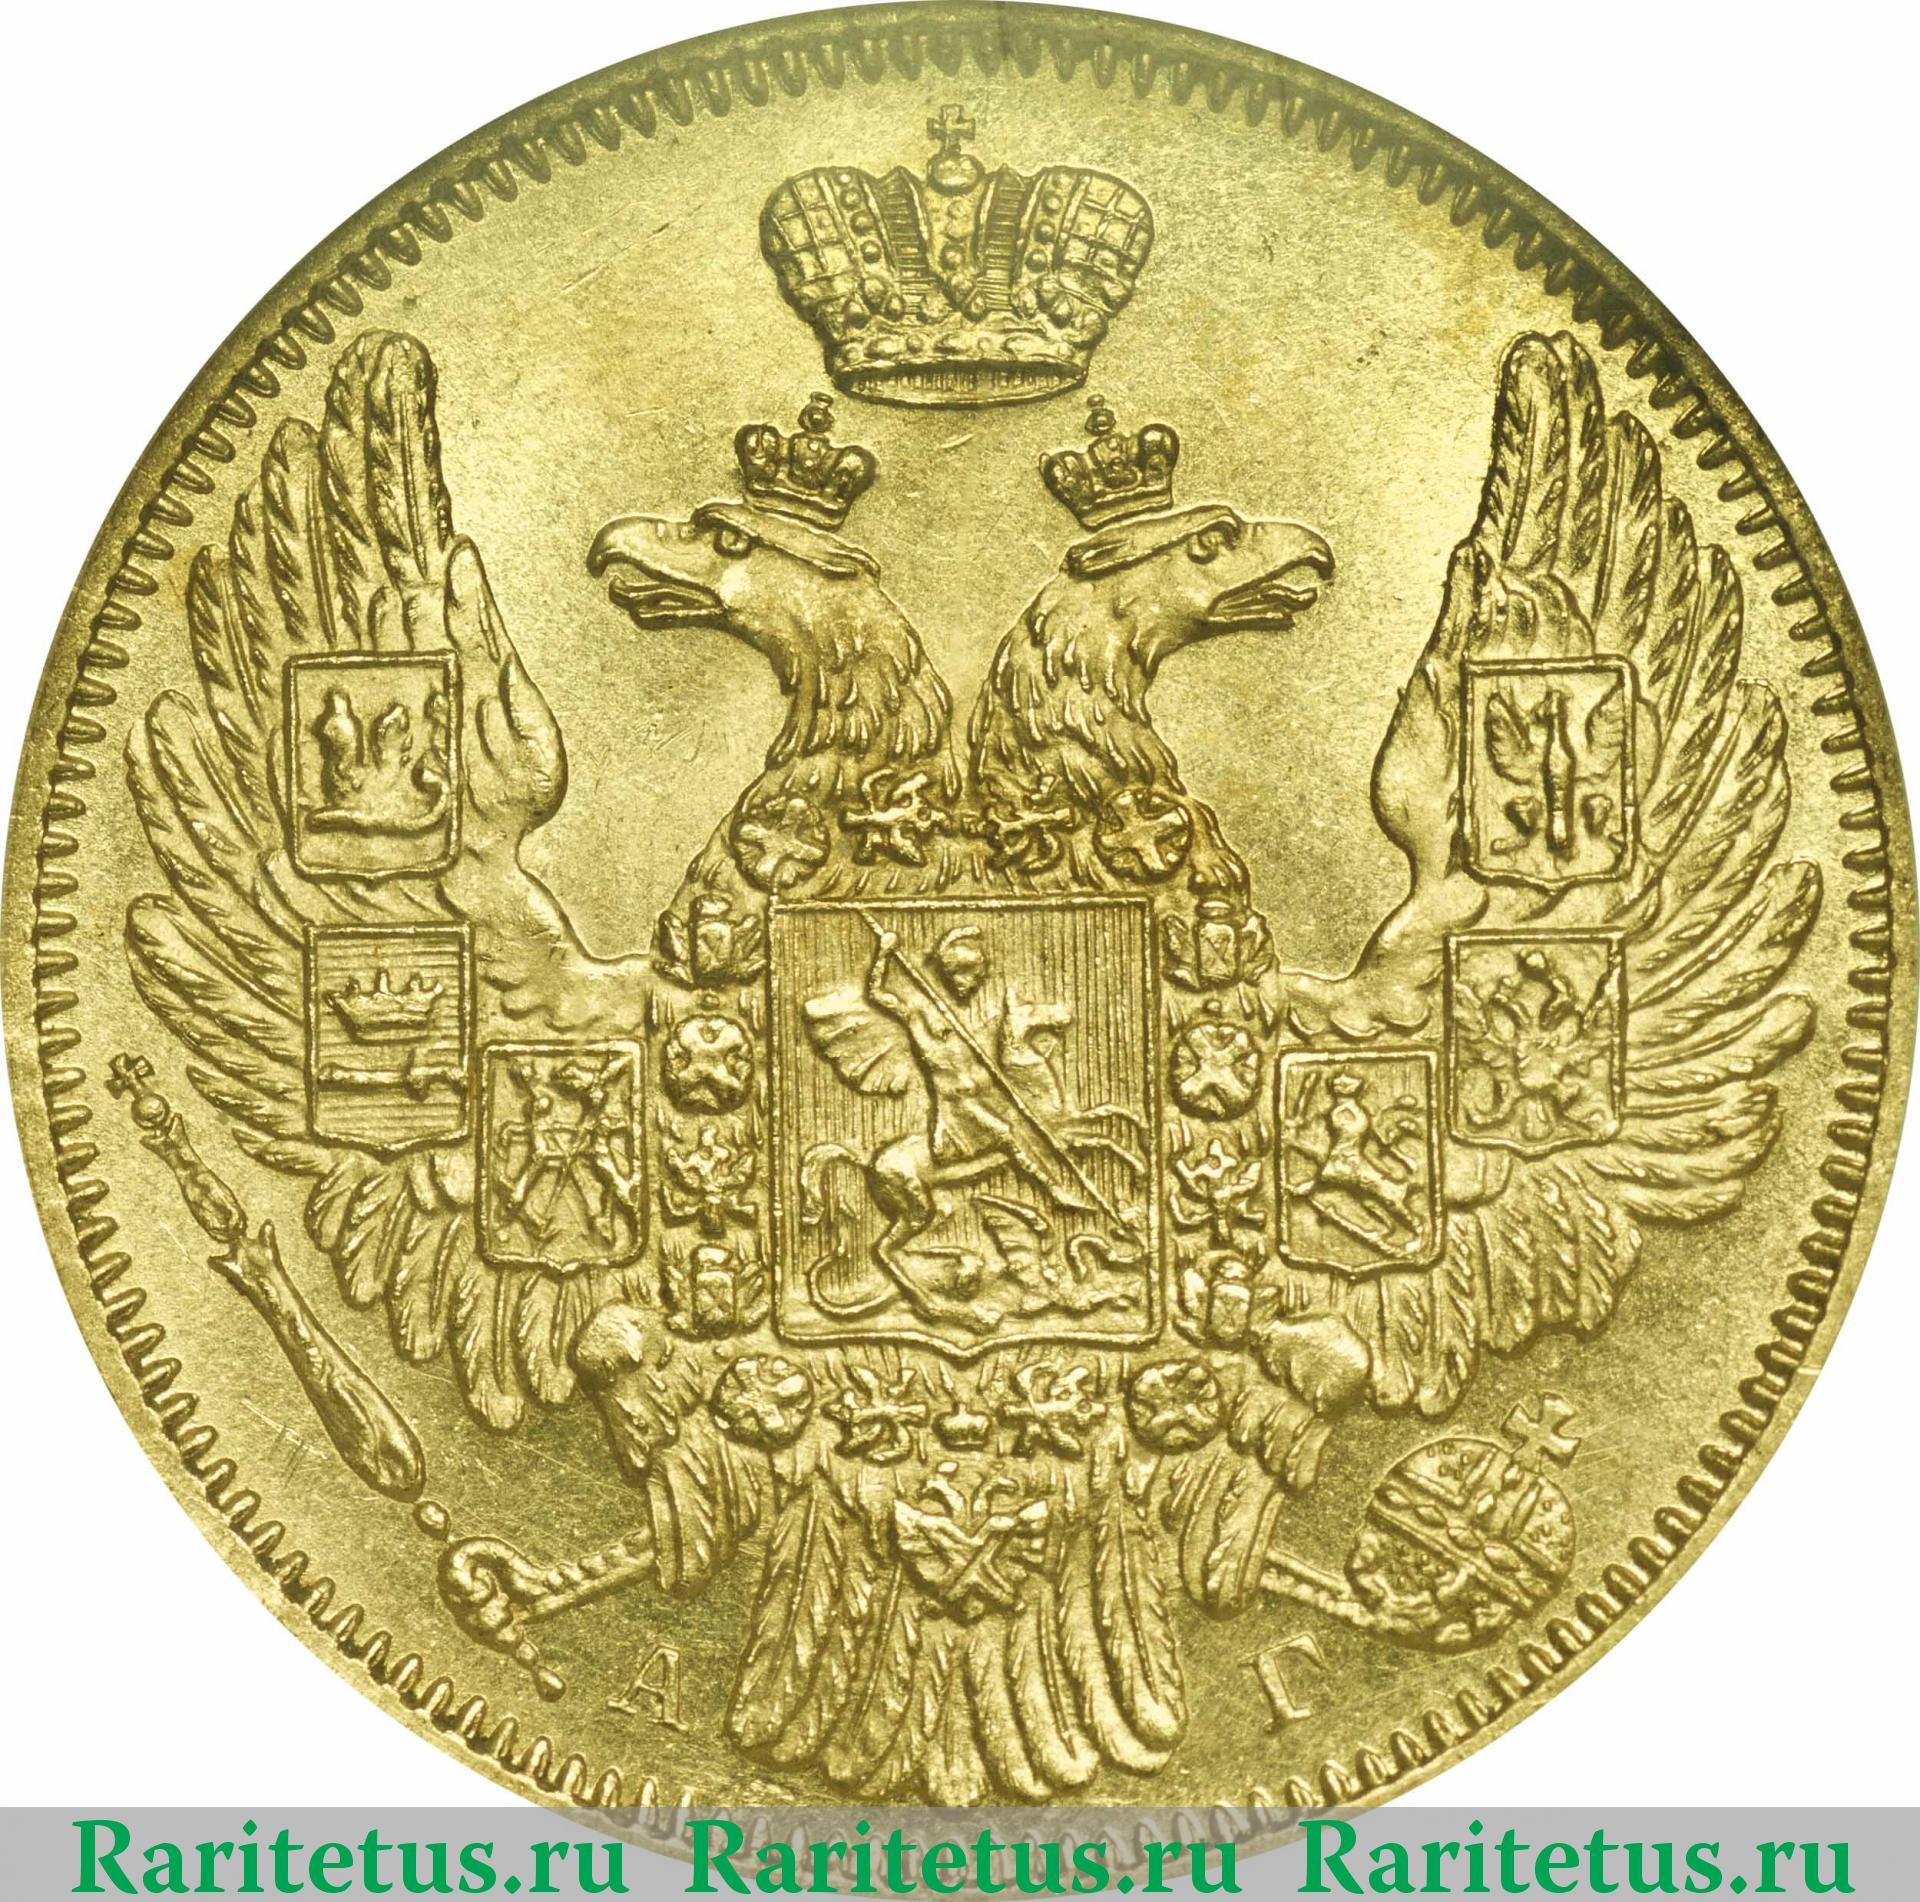 Аверс монеты 5 рублей 1846 года СПБ-АГ орёл 1845